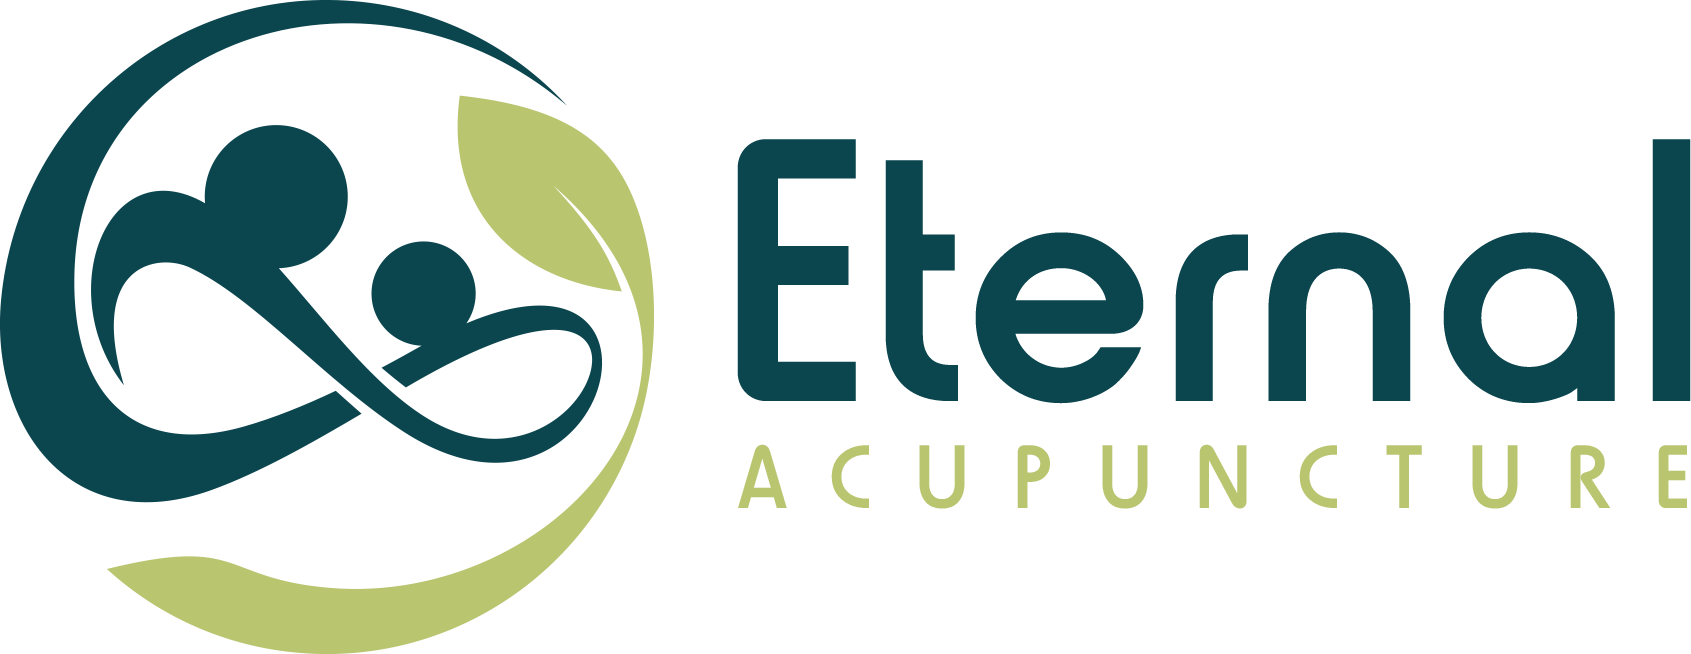 Eternal Acupuncture - Boca Raton Wellness Center Logo